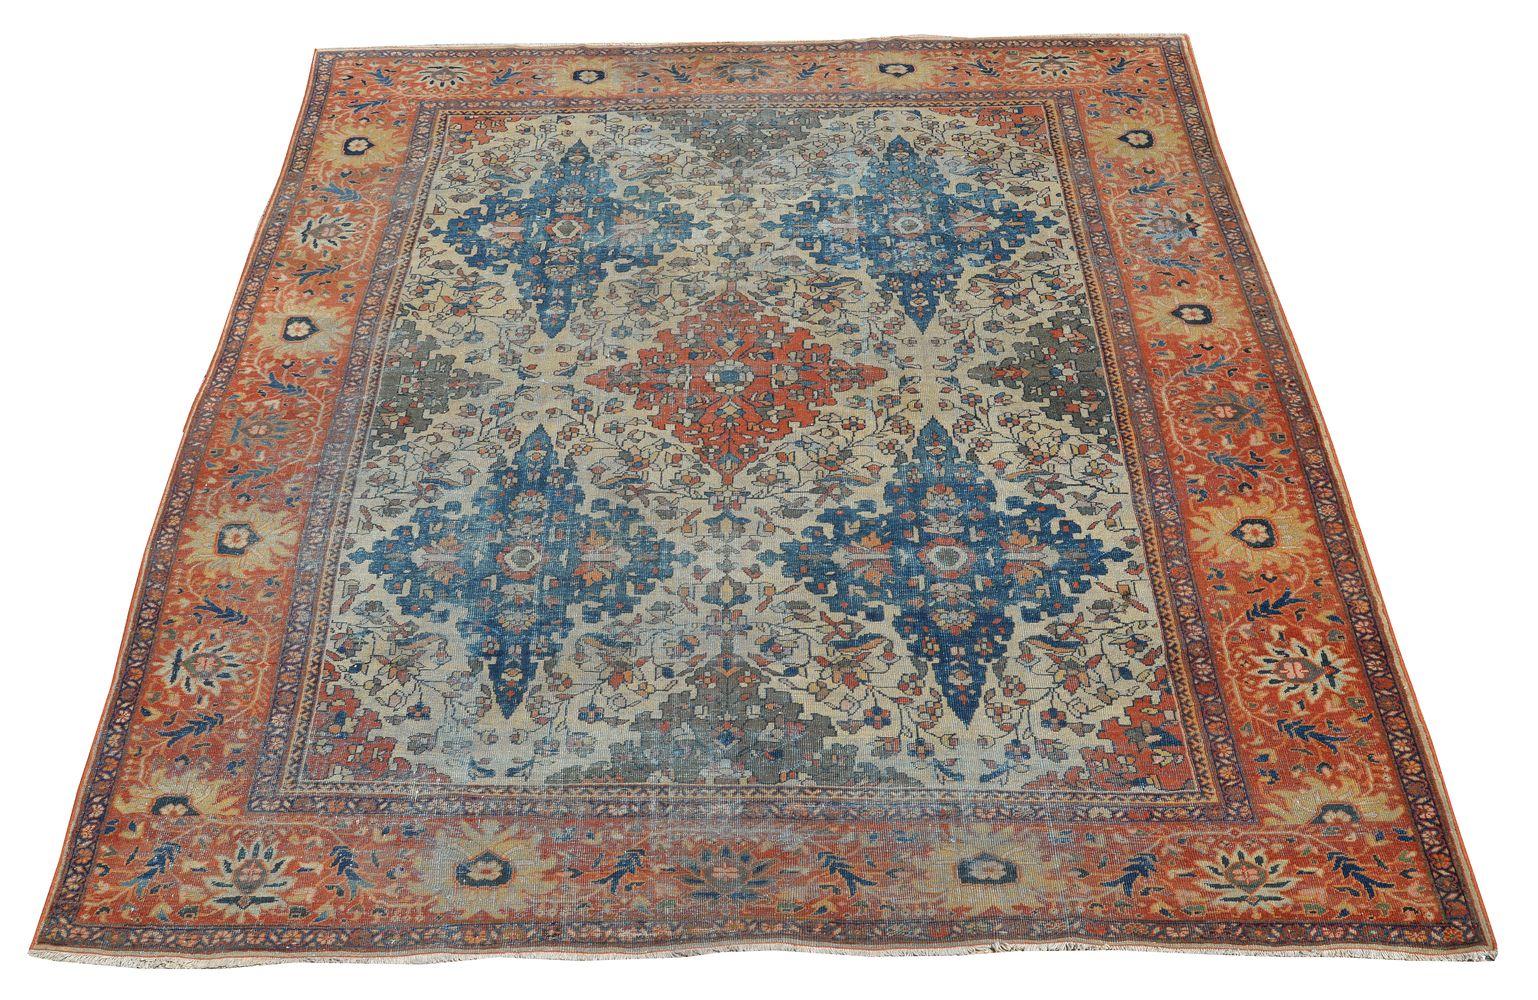 Lot 434 - A Feraghan carpet